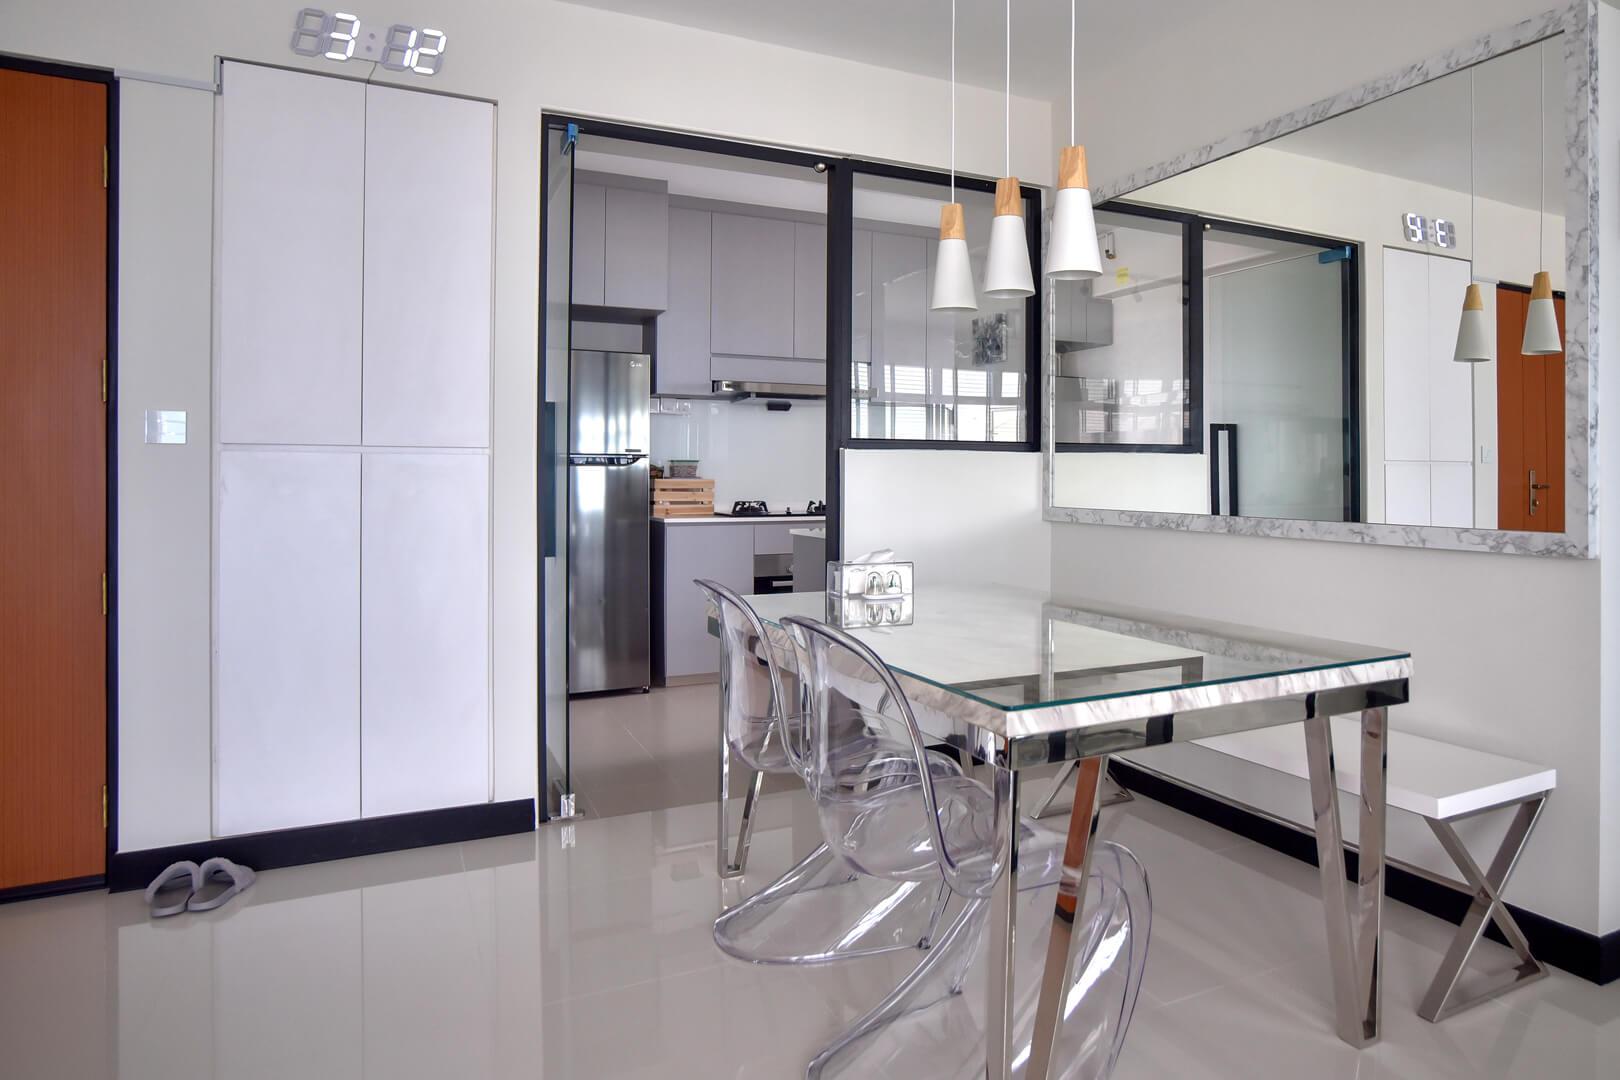 white-monochrome-interior-design-kitchen-dinning-area